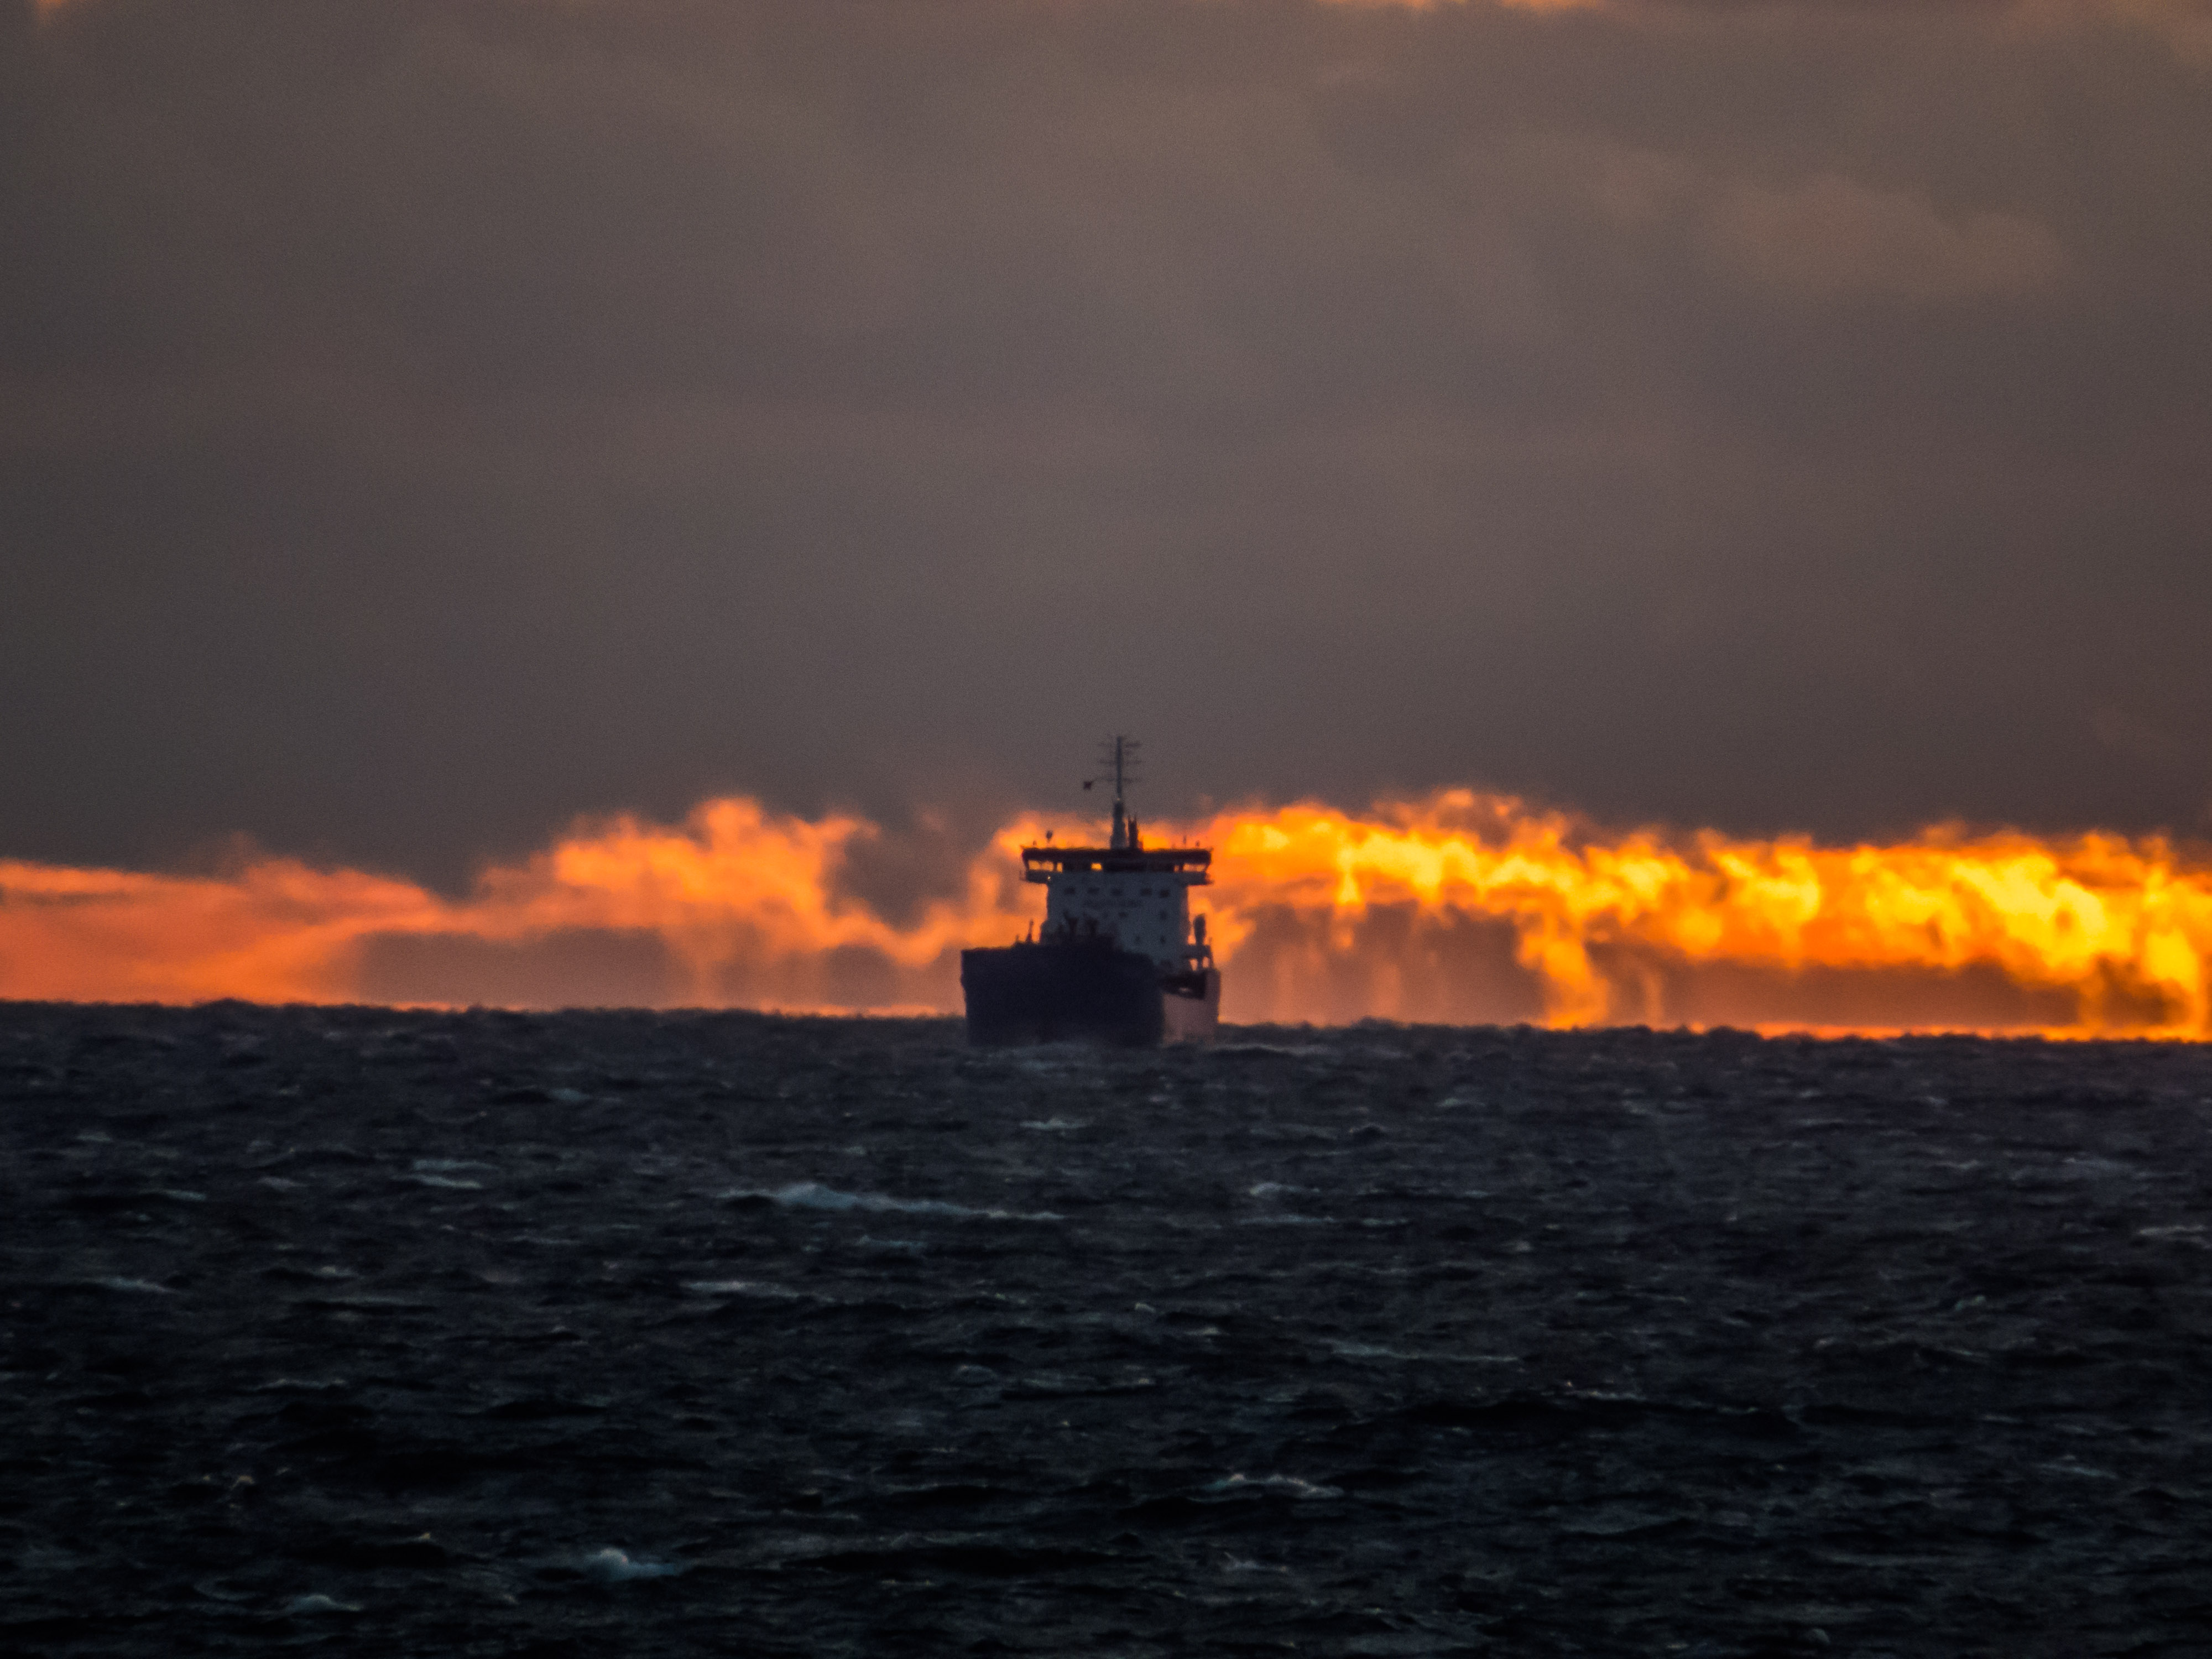 Ship on sunset fire, Armageddon, Ship, Water, Theme, HQ Photo